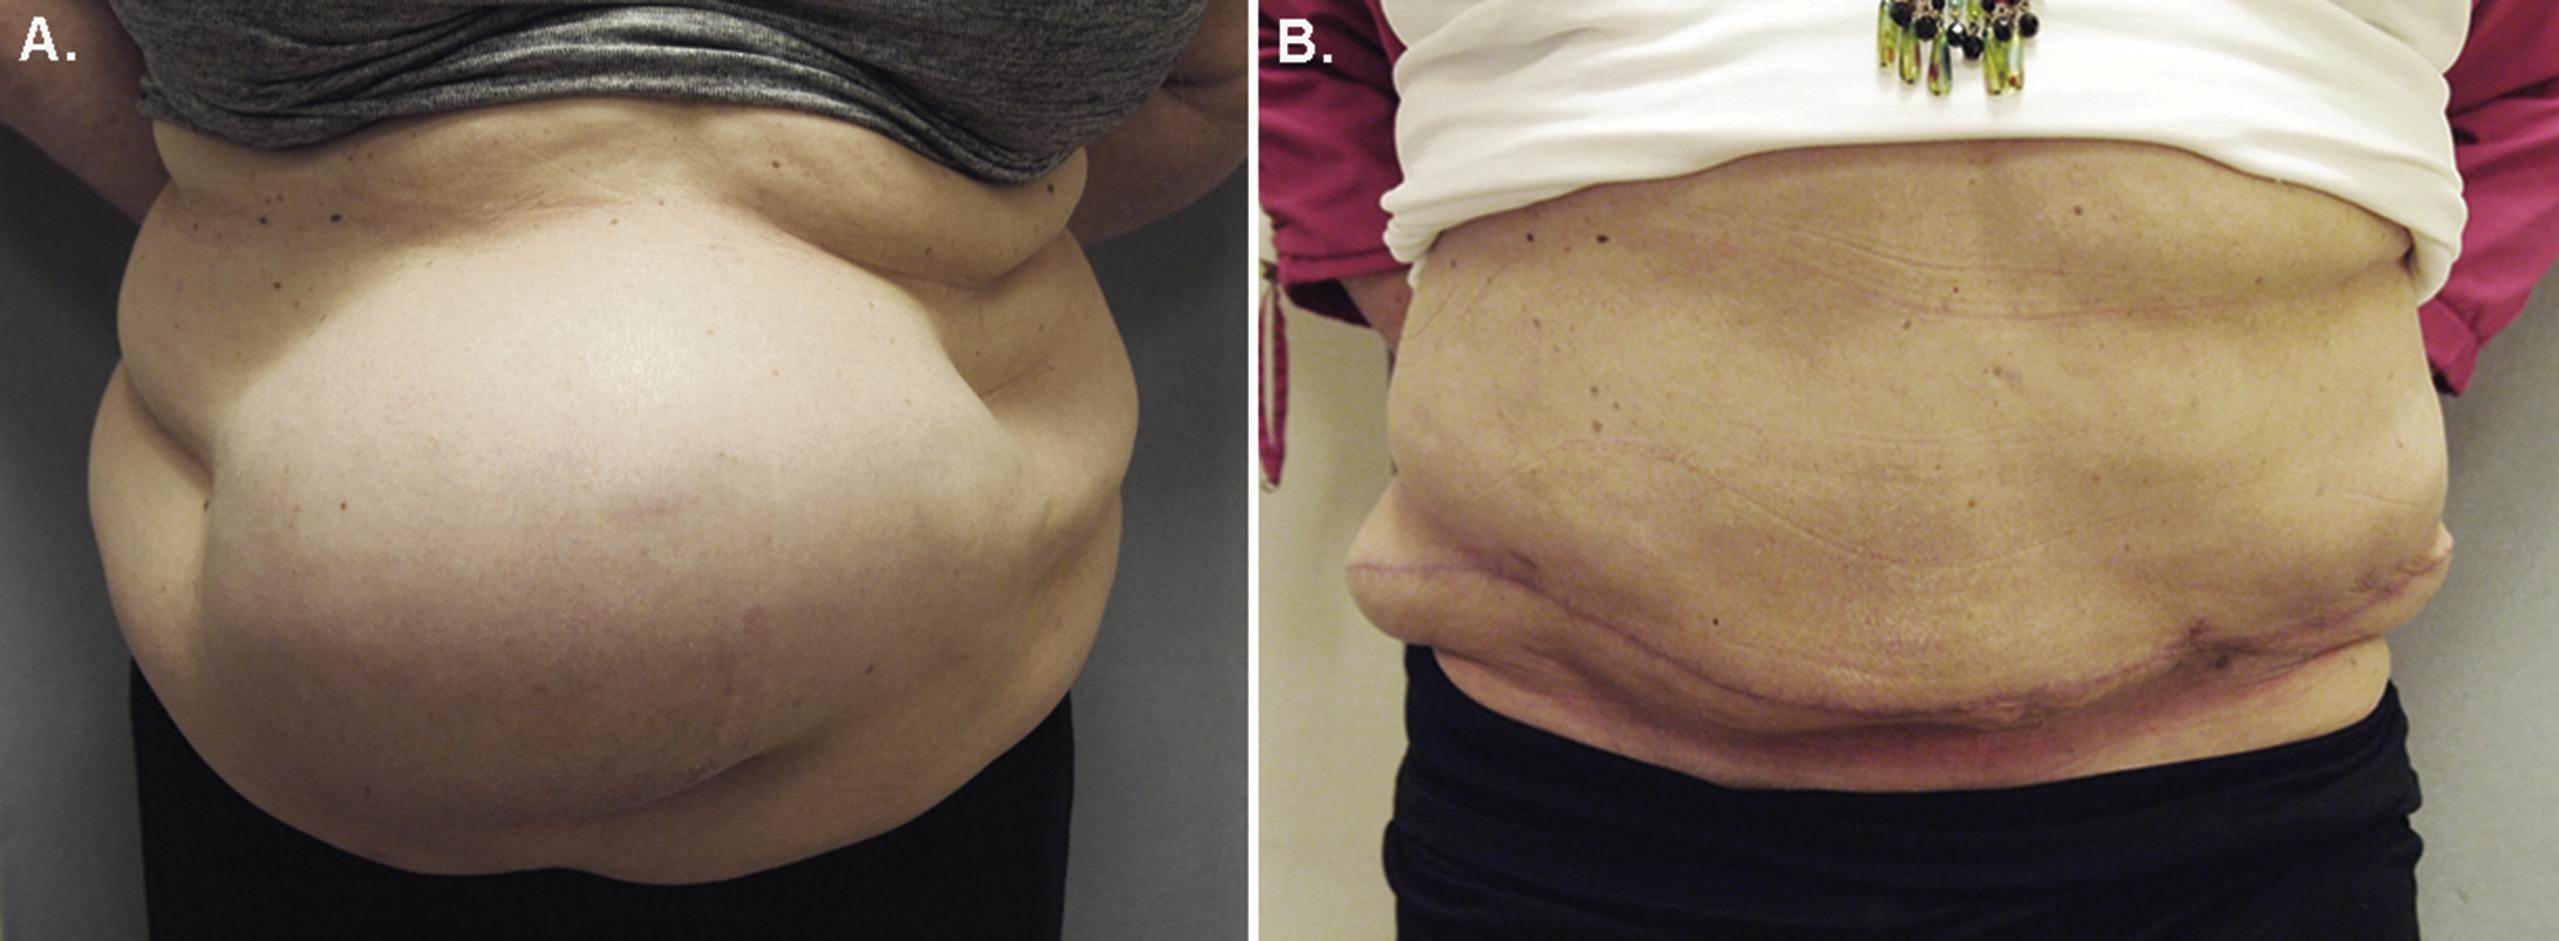 Hernia Repair Panniculectomy